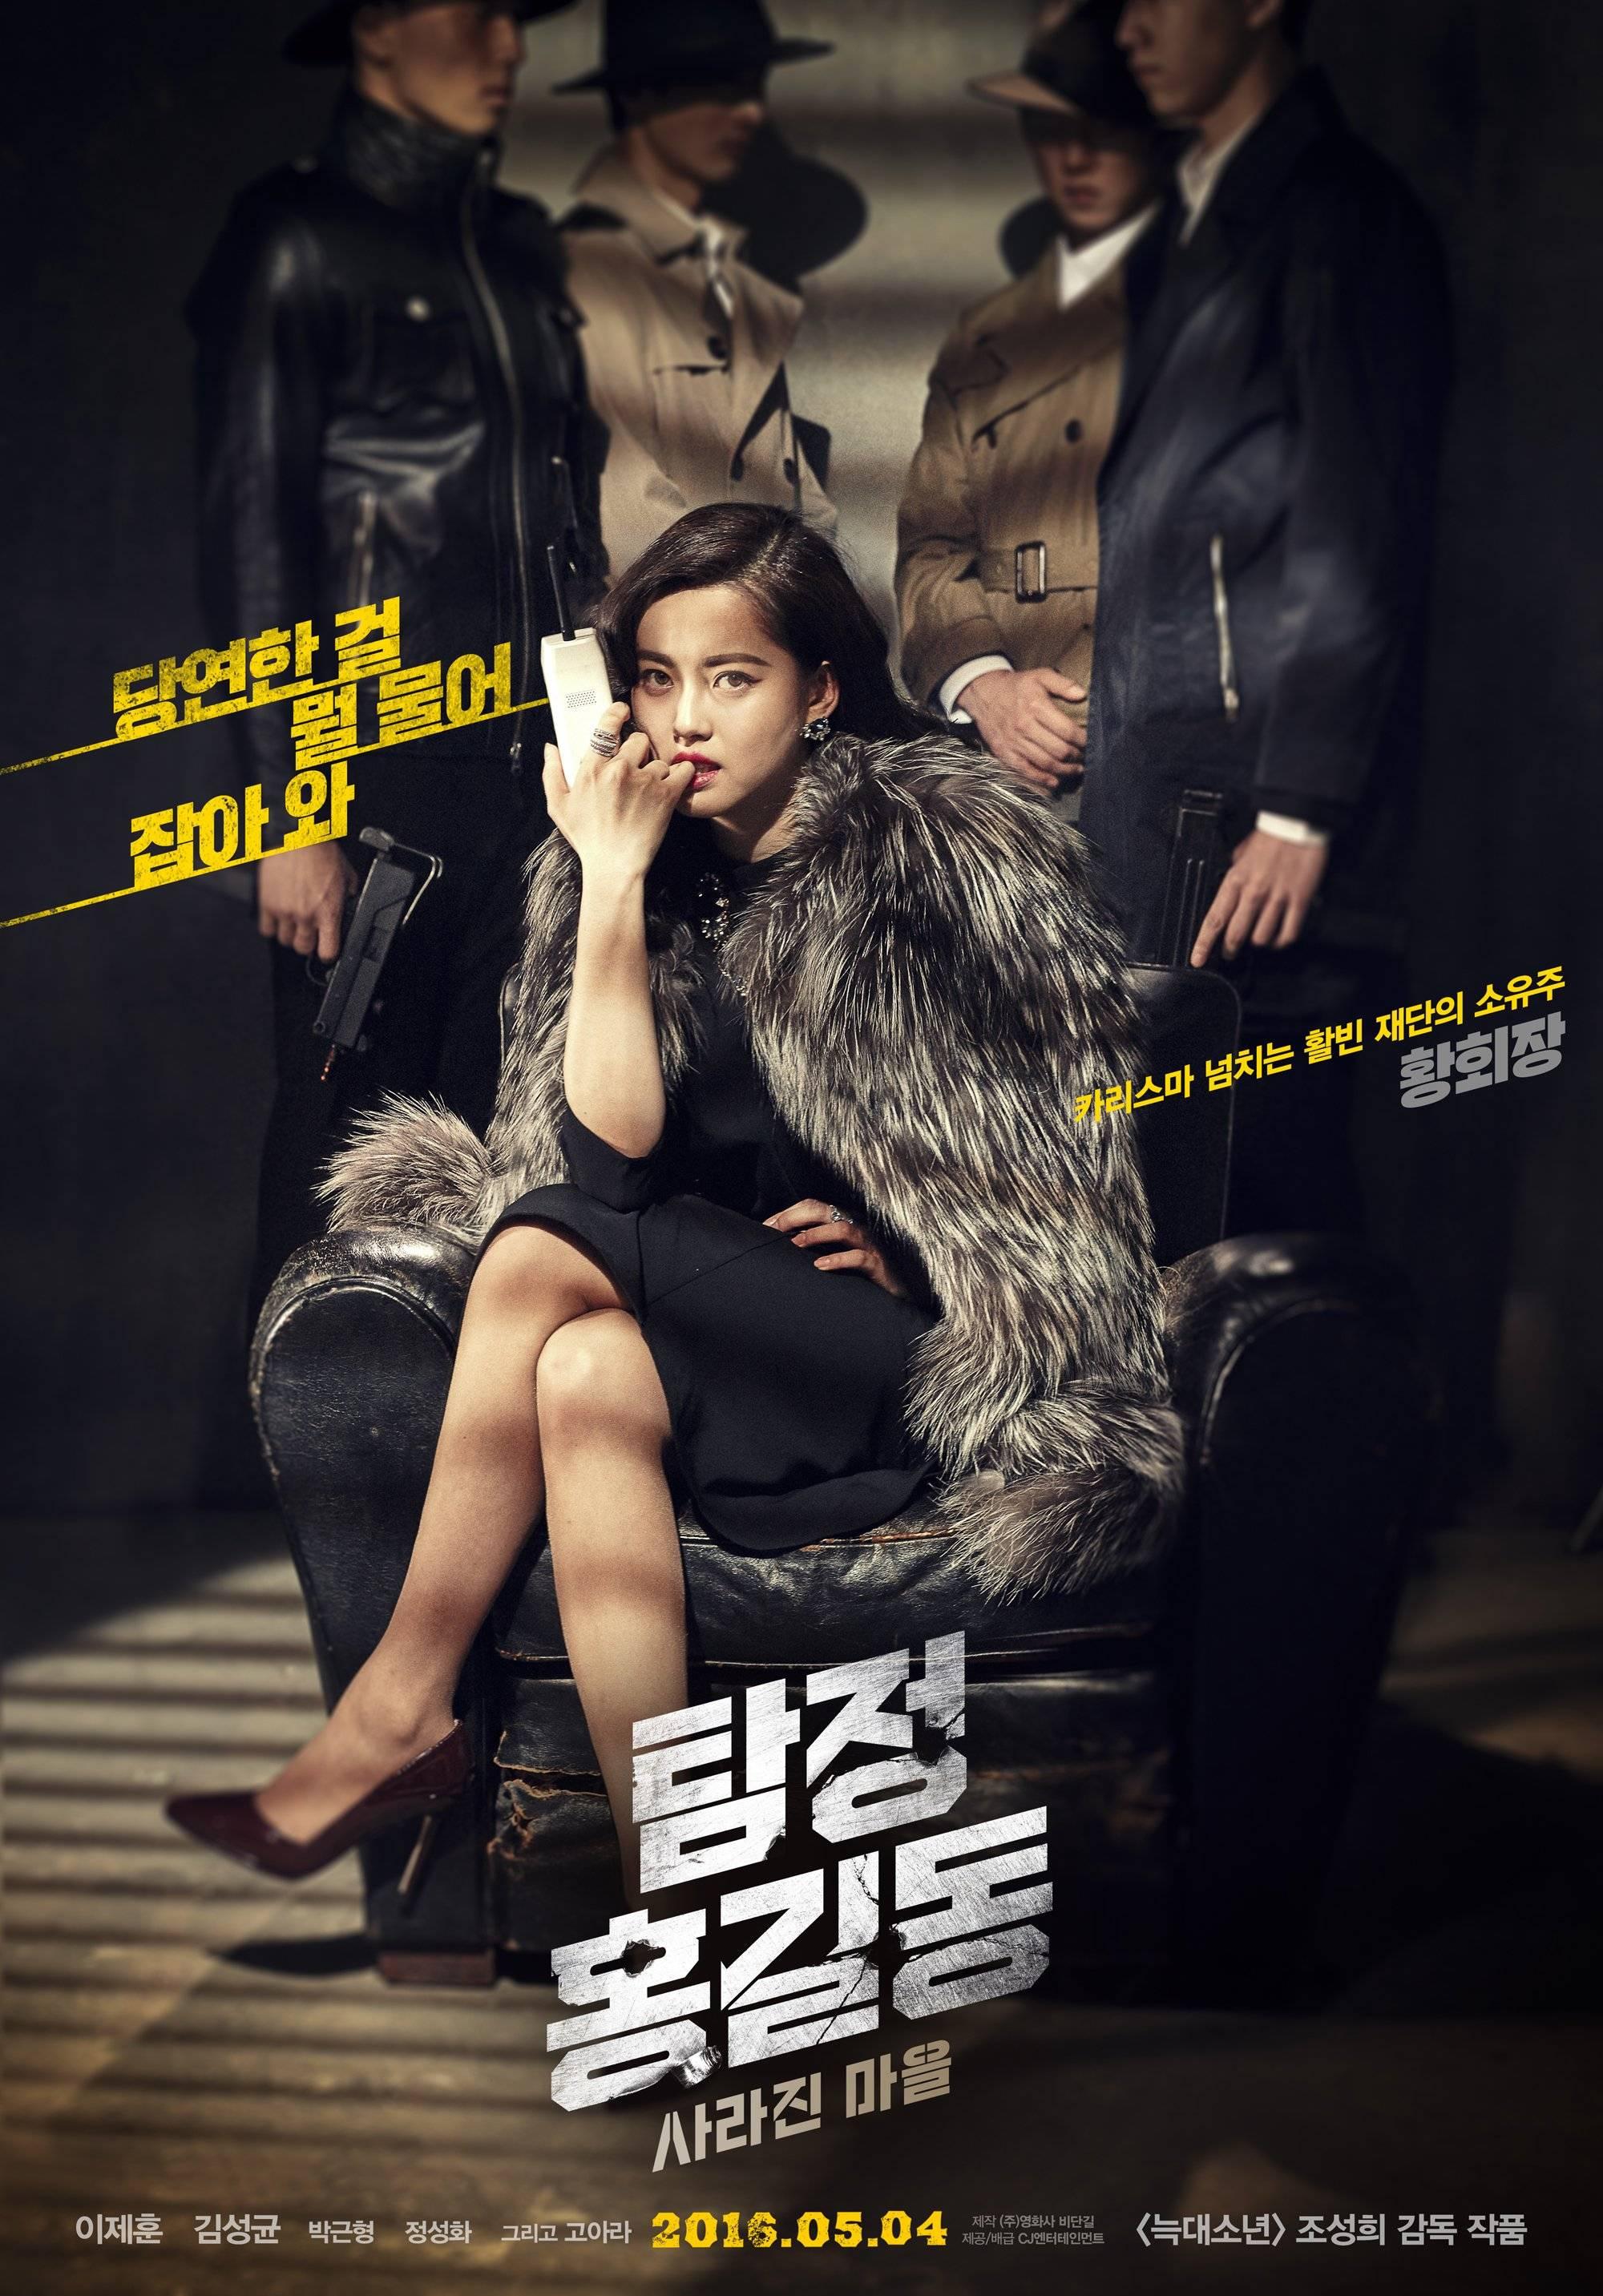 Detective 2016 full movie - 4 8